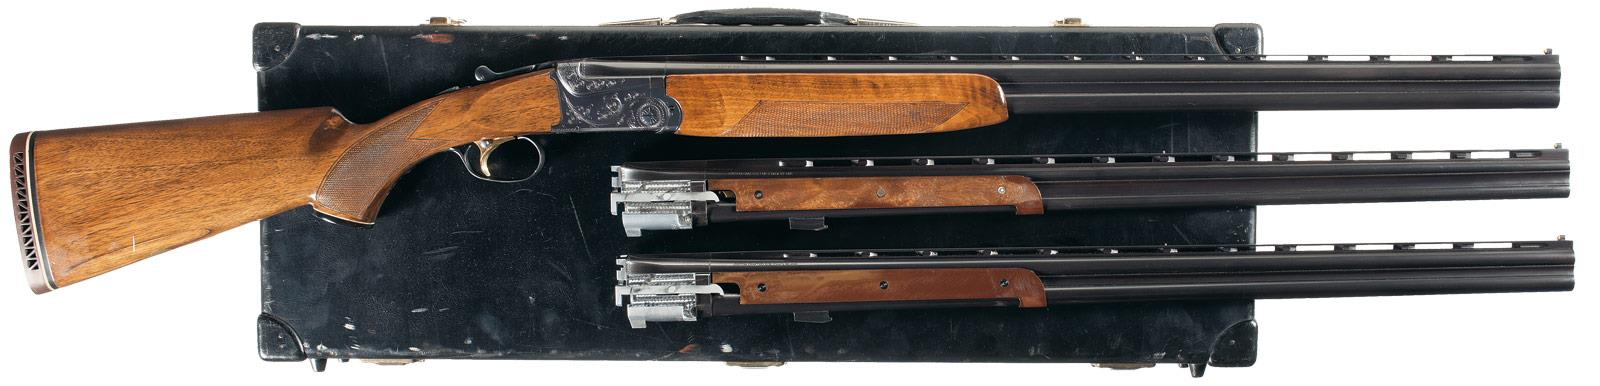 Cased Three Barrel Set Ithaca Model 600 Over/Under Shotgun